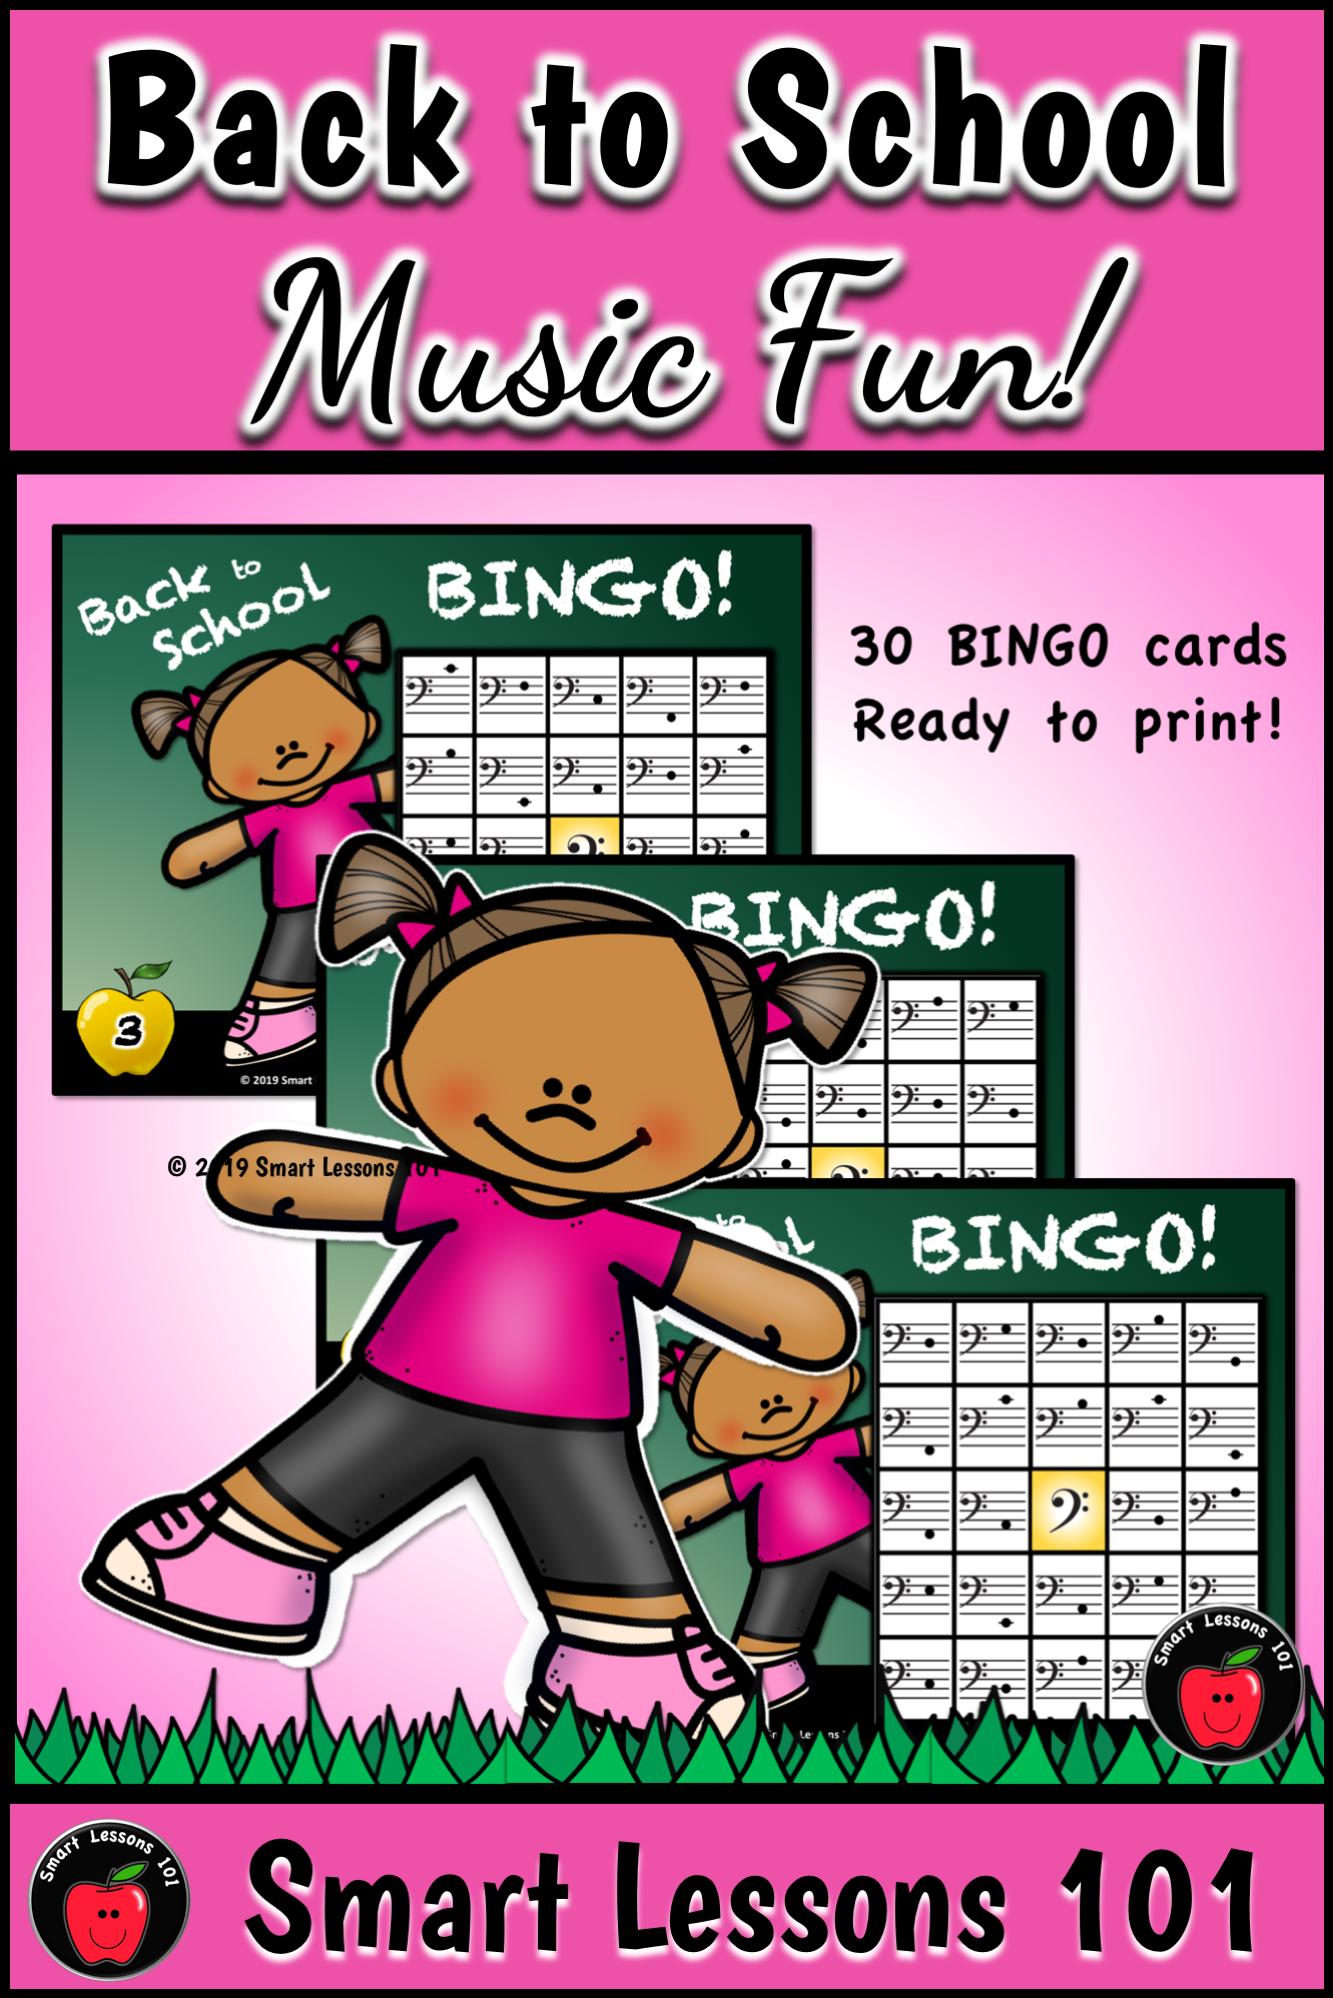 Back To School Bass Clef Bingo Game Back To School Note